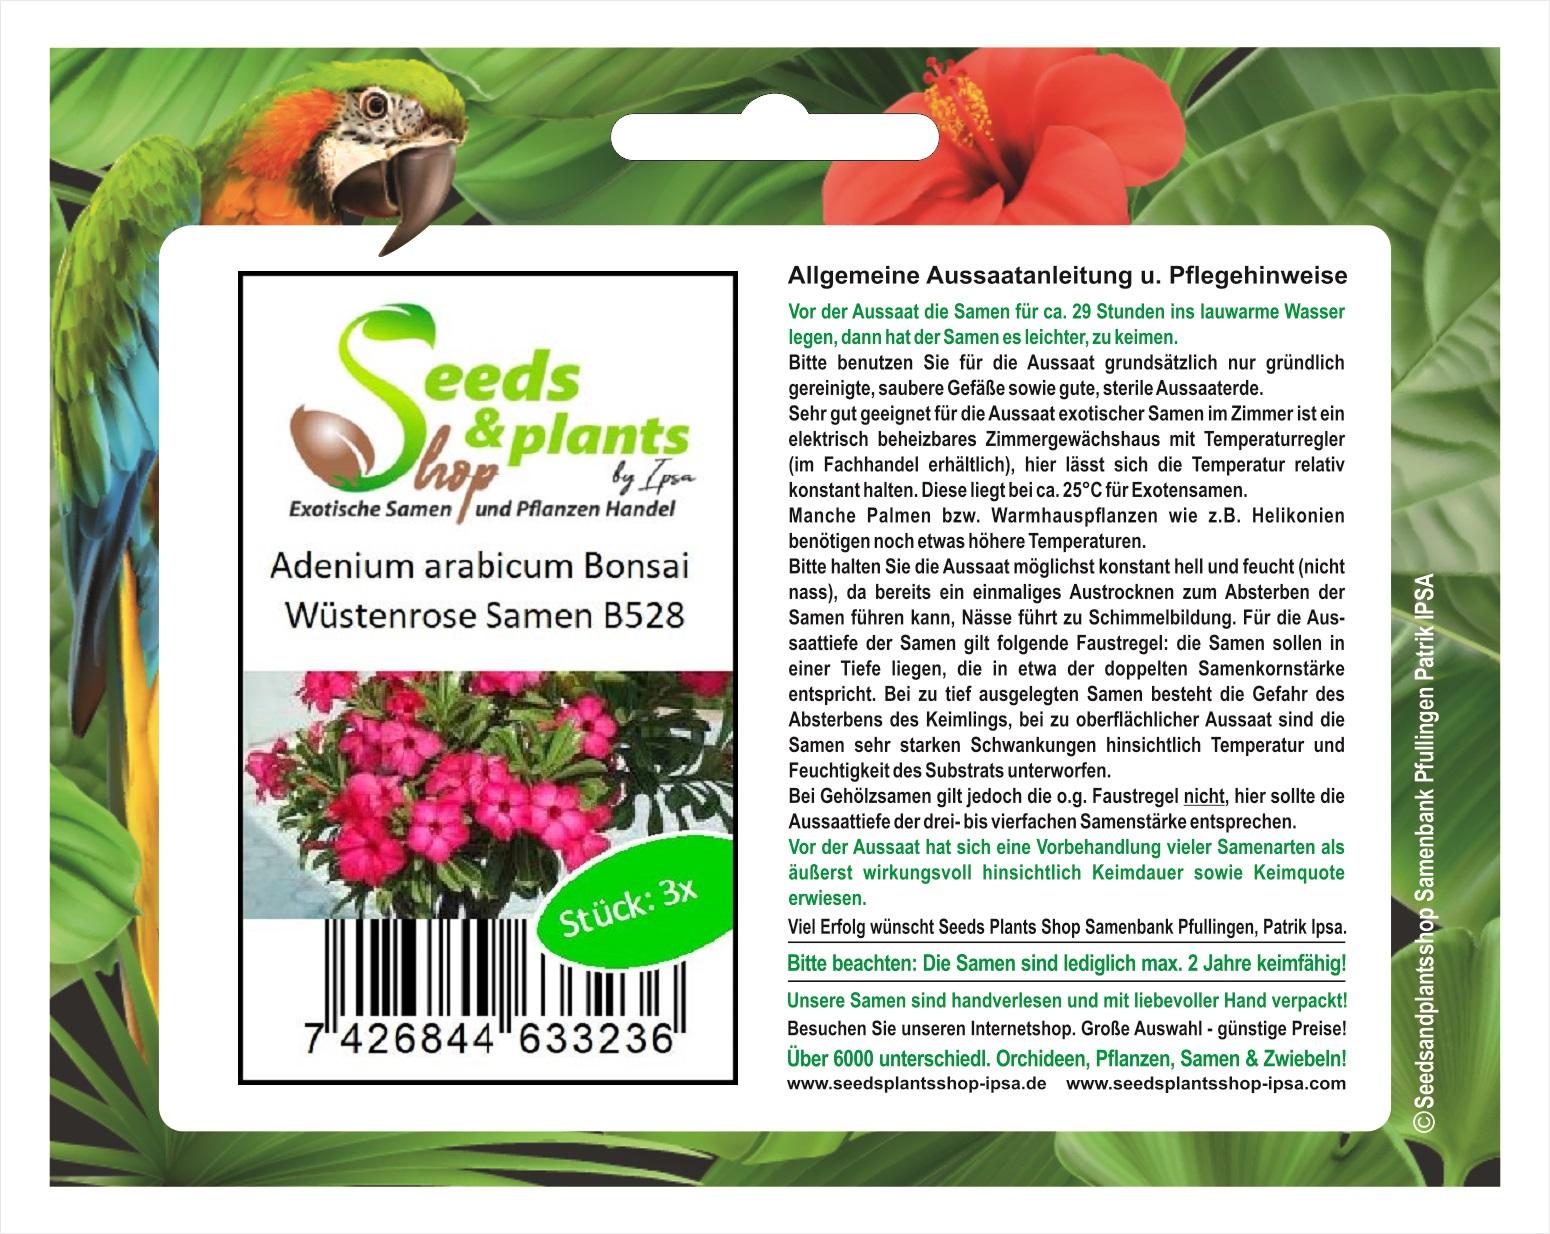 "5x Wüstenrose Blume Adenium /""PEONY/"" Bonsai Samen Hausgarten beste R2L1 Pfla G3H8"